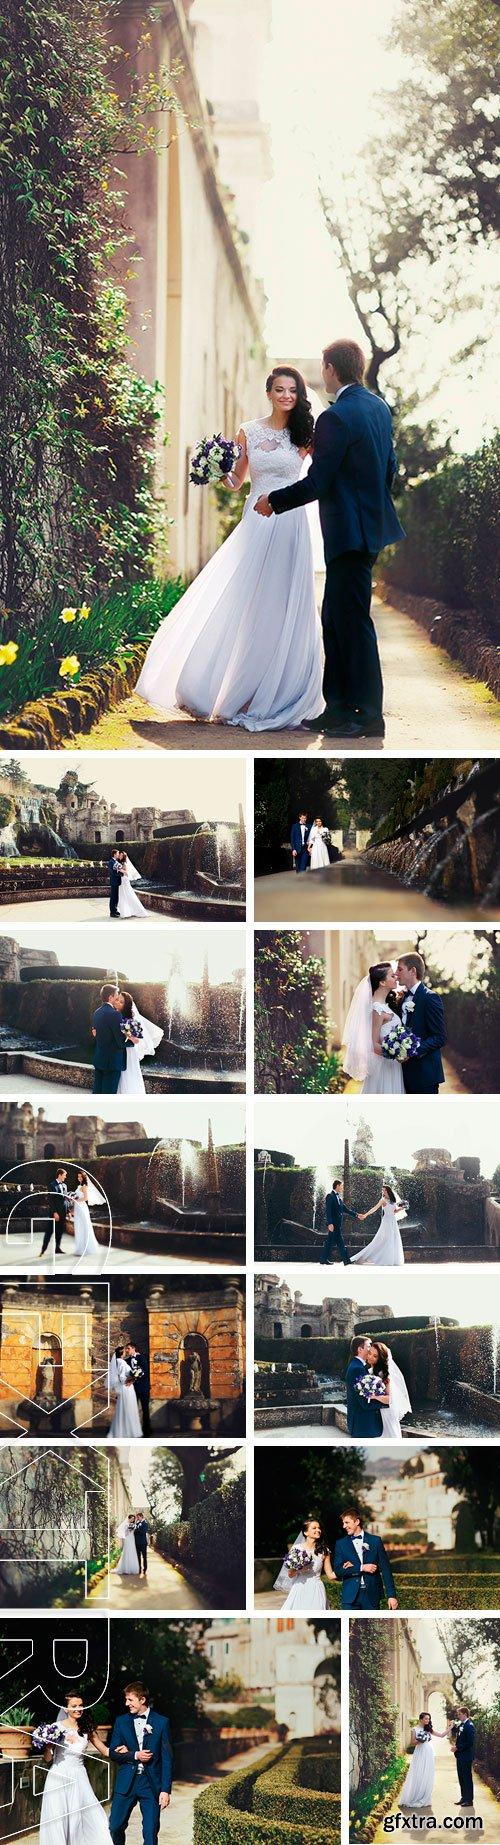 Stock Photos - Romantic young stylish italian newlyweds